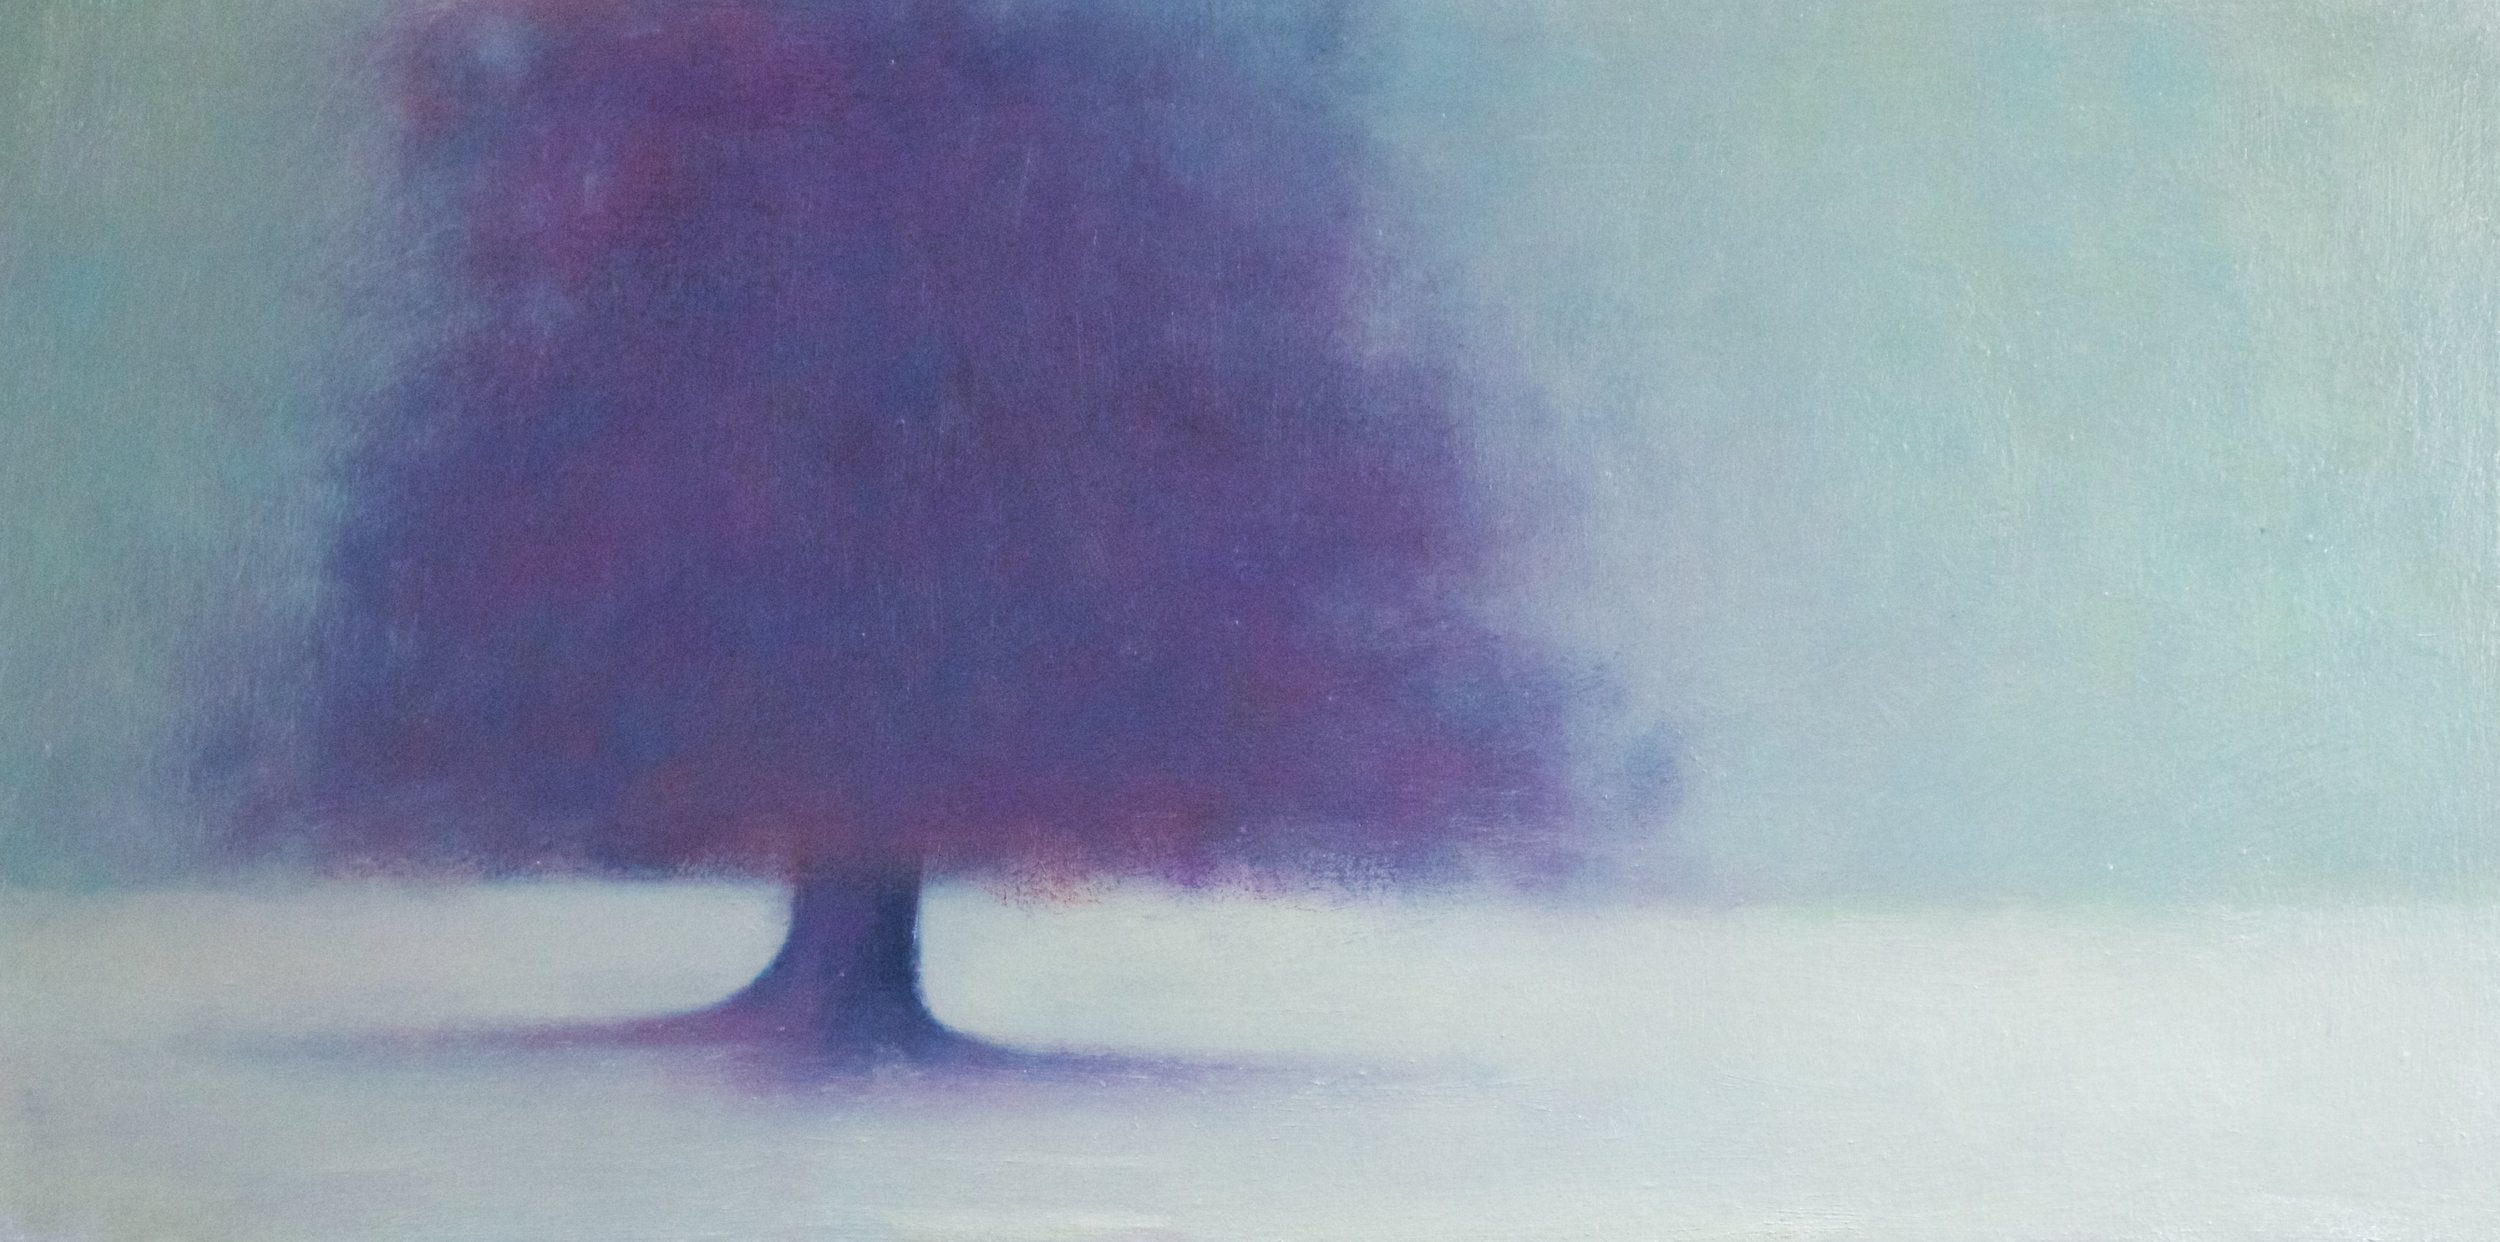 Title: Half Light  Size: 30 x 60 cm  Medium: Oil on canvas  Price: £995